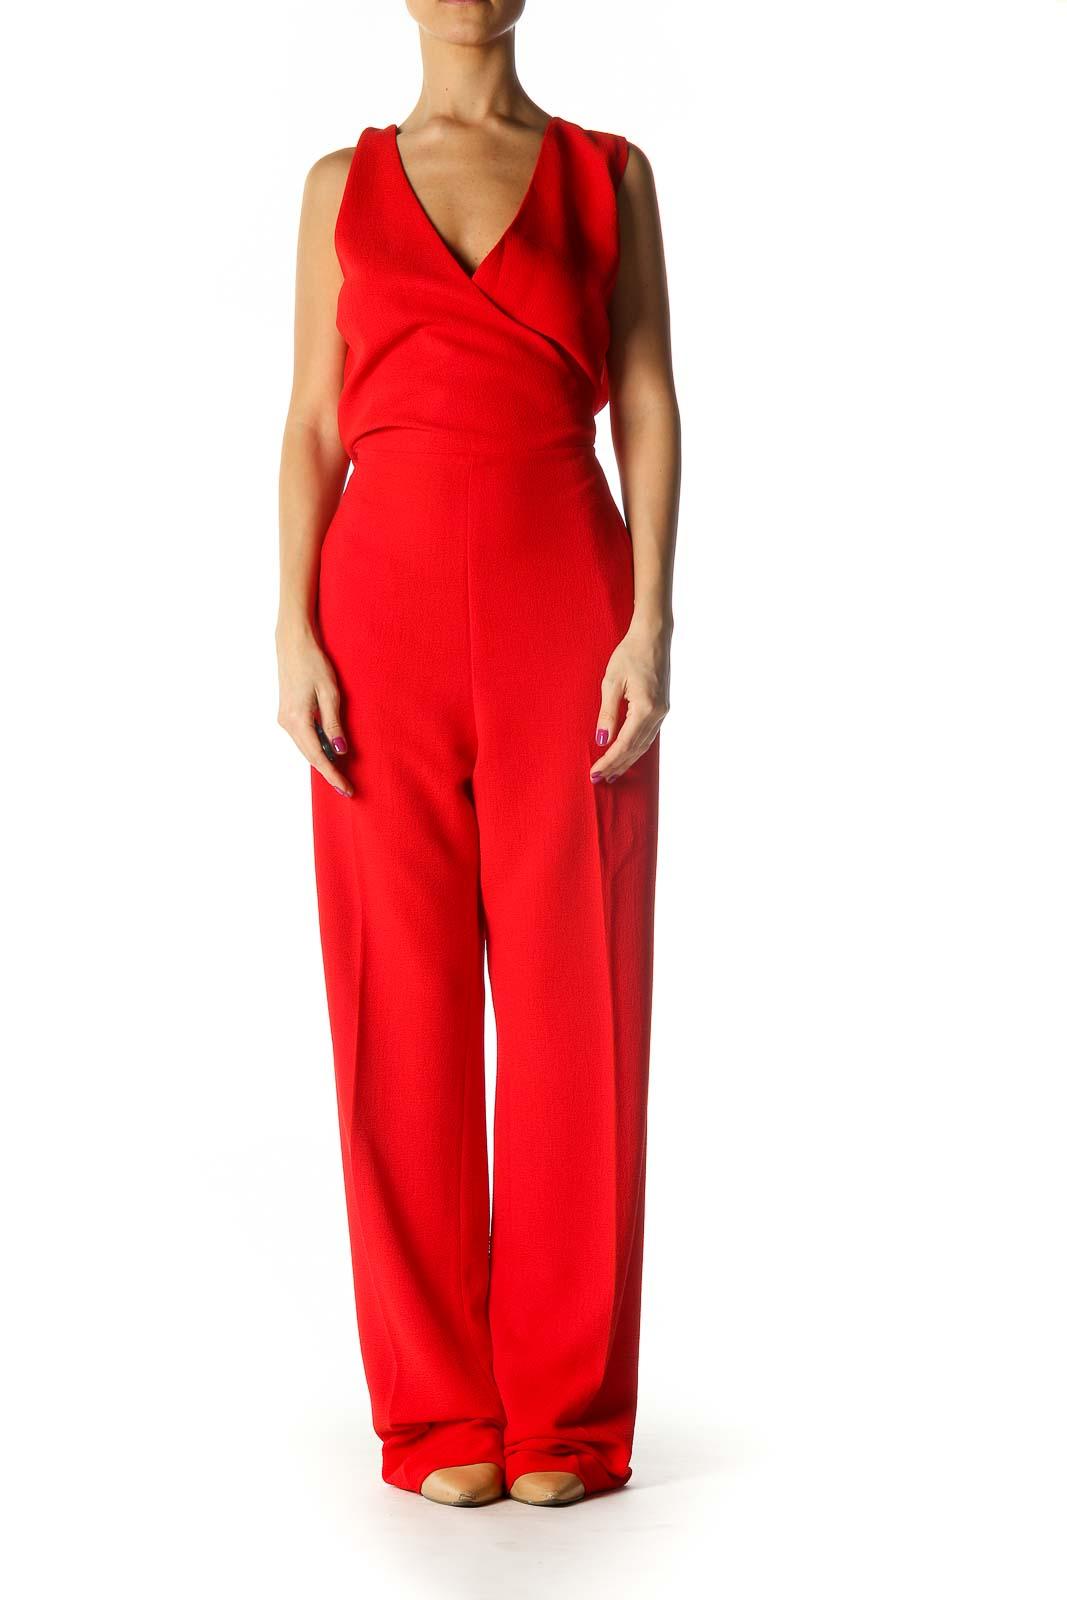 Red V-Neck Chic Jumpsuit Front